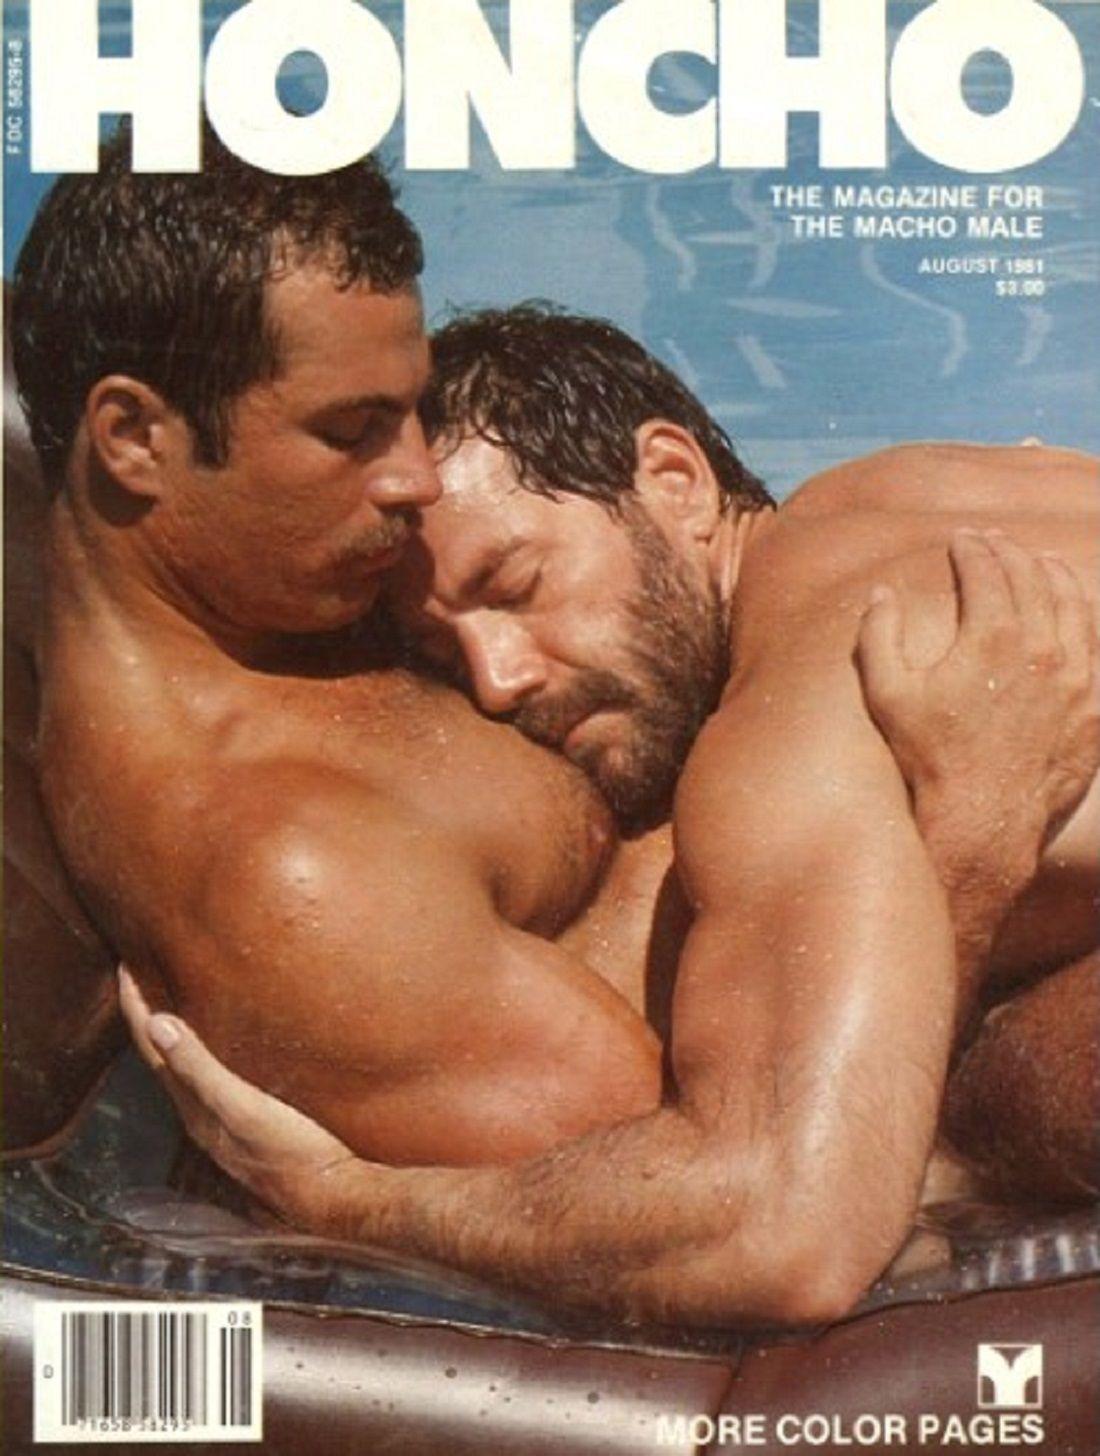 from Sullivan gay paducah